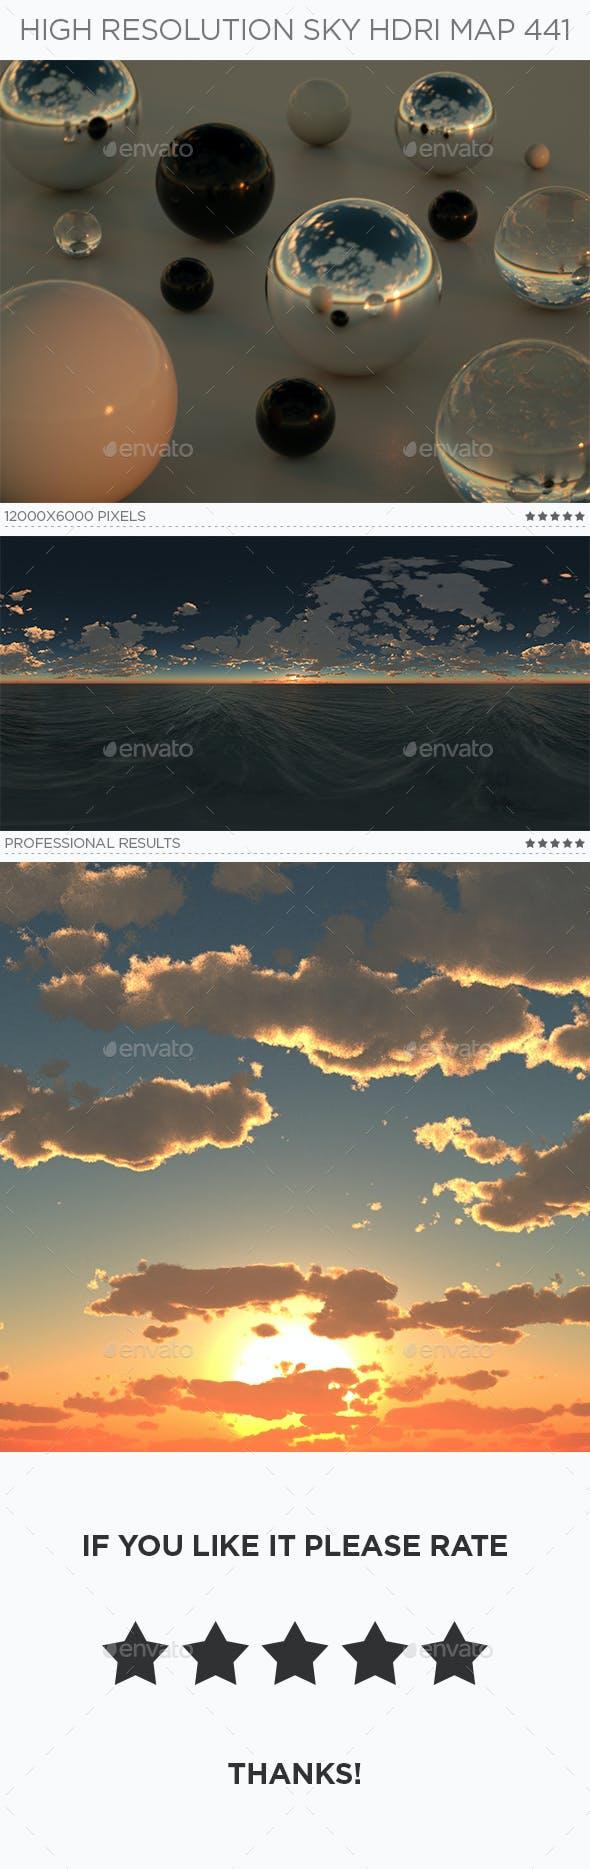 High Resolution Sky HDRi Map 441 - 3DOcean Item for Sale